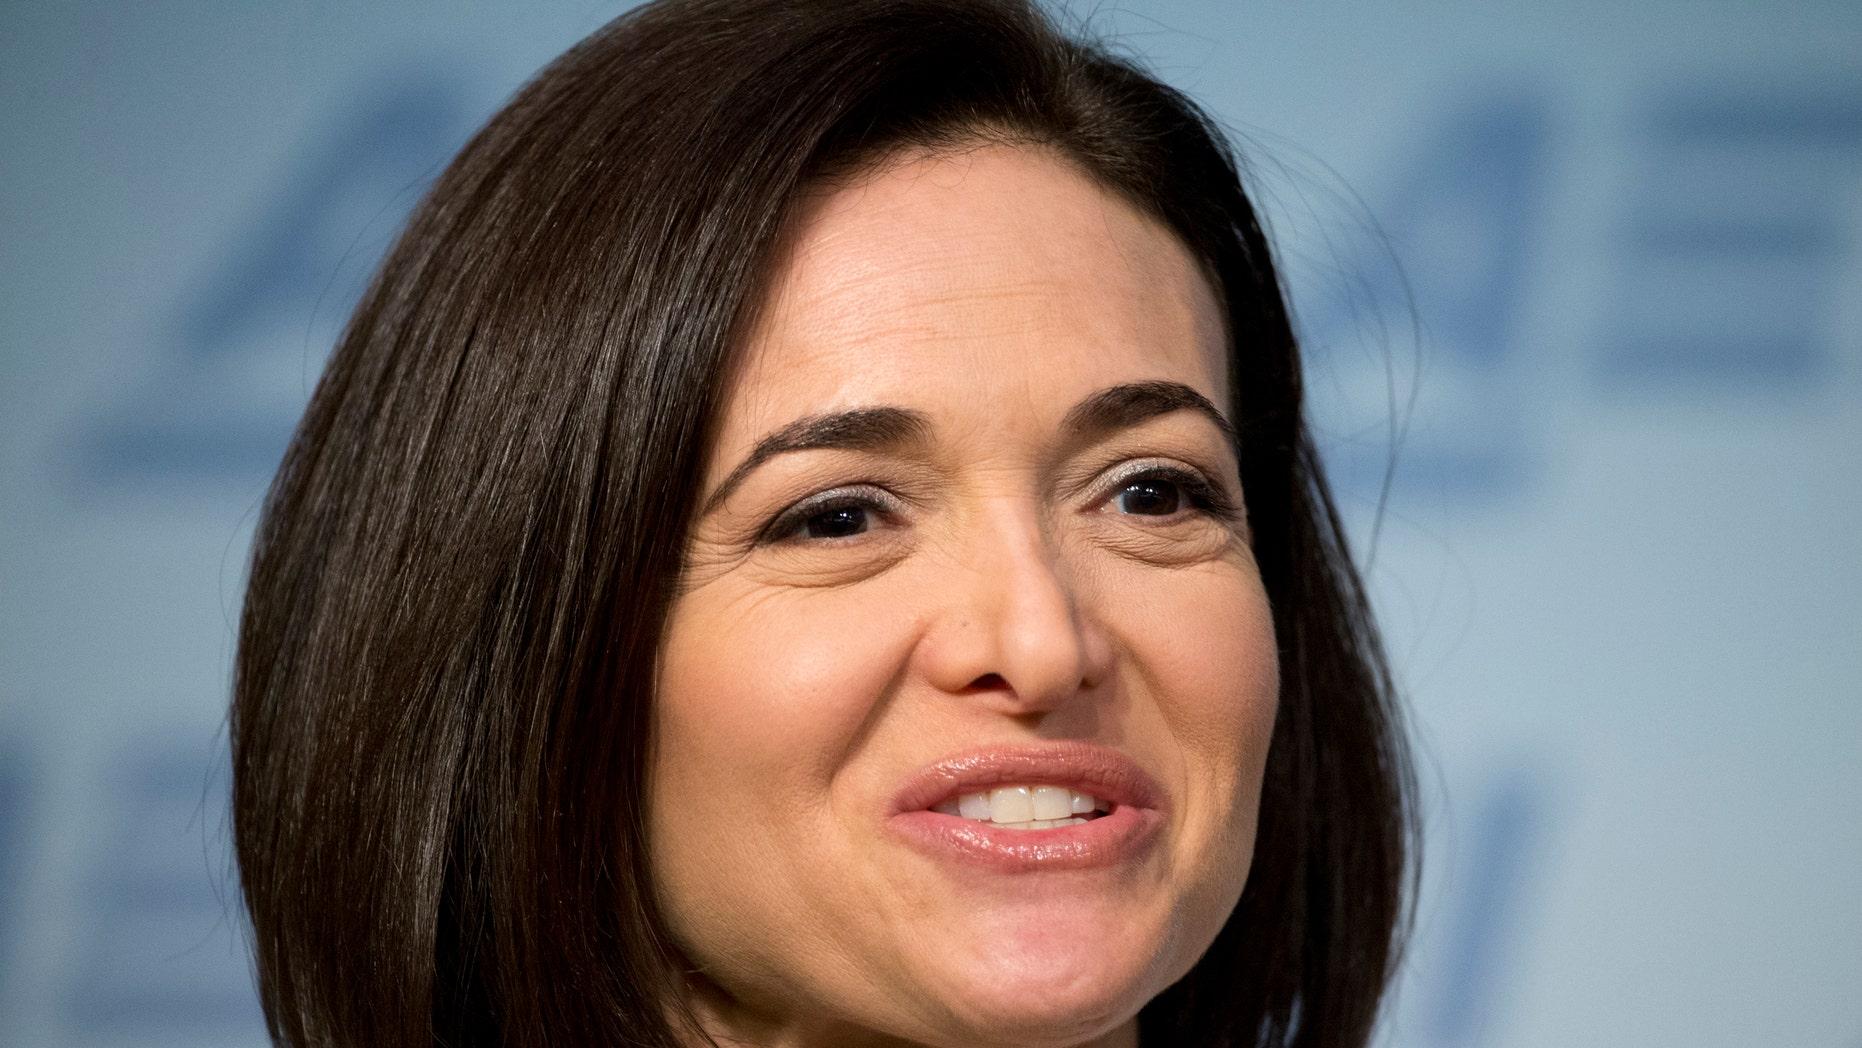 Facebook COO Sheryl Sandberg speaks at American Enterprise Institute in June 2016.